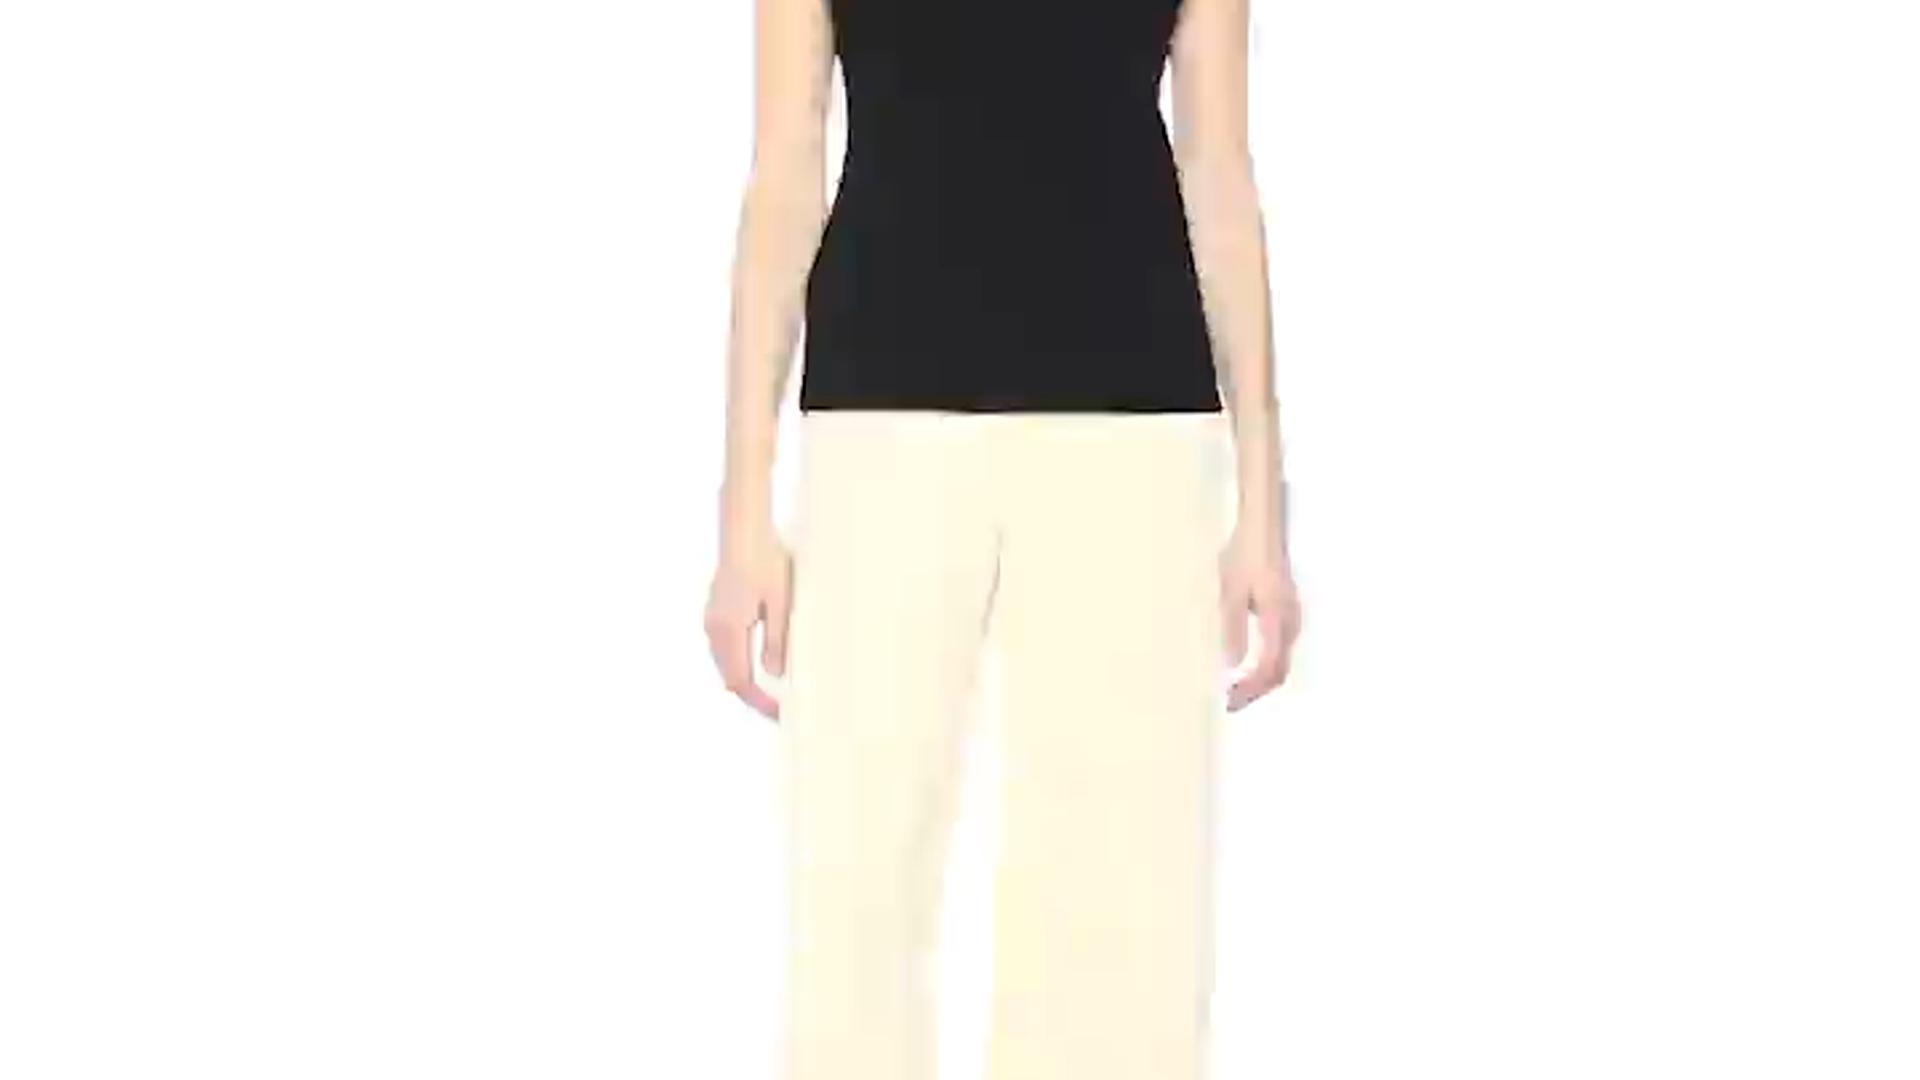 8eb783c71a1512 Amazon.com  Theory Women s Sleeveless Draped Boatneck Top  Clothing